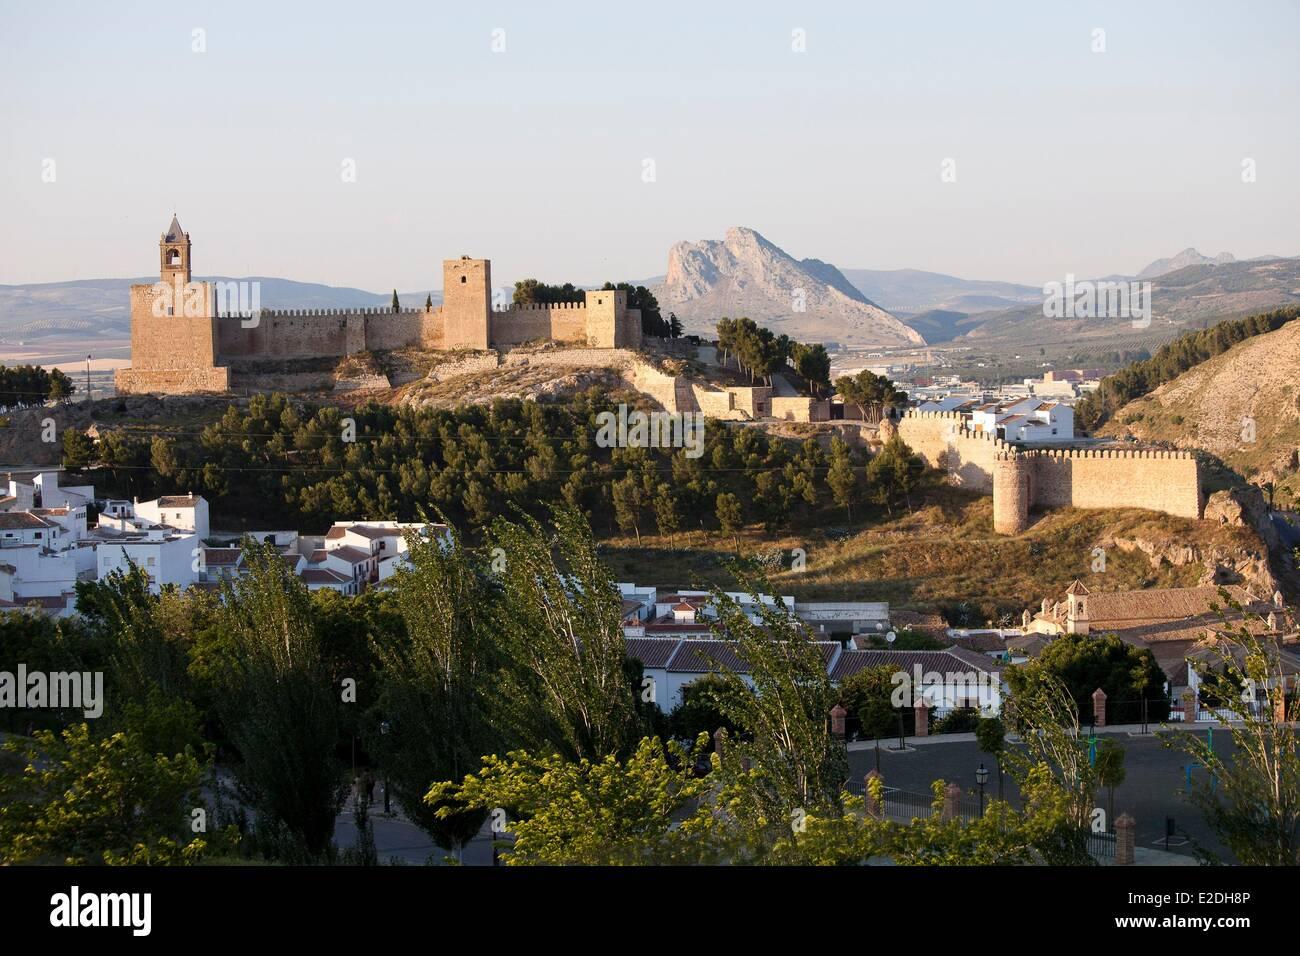 Spain, Andalusia, Antequera, white village, Alcazaba - Stock Image